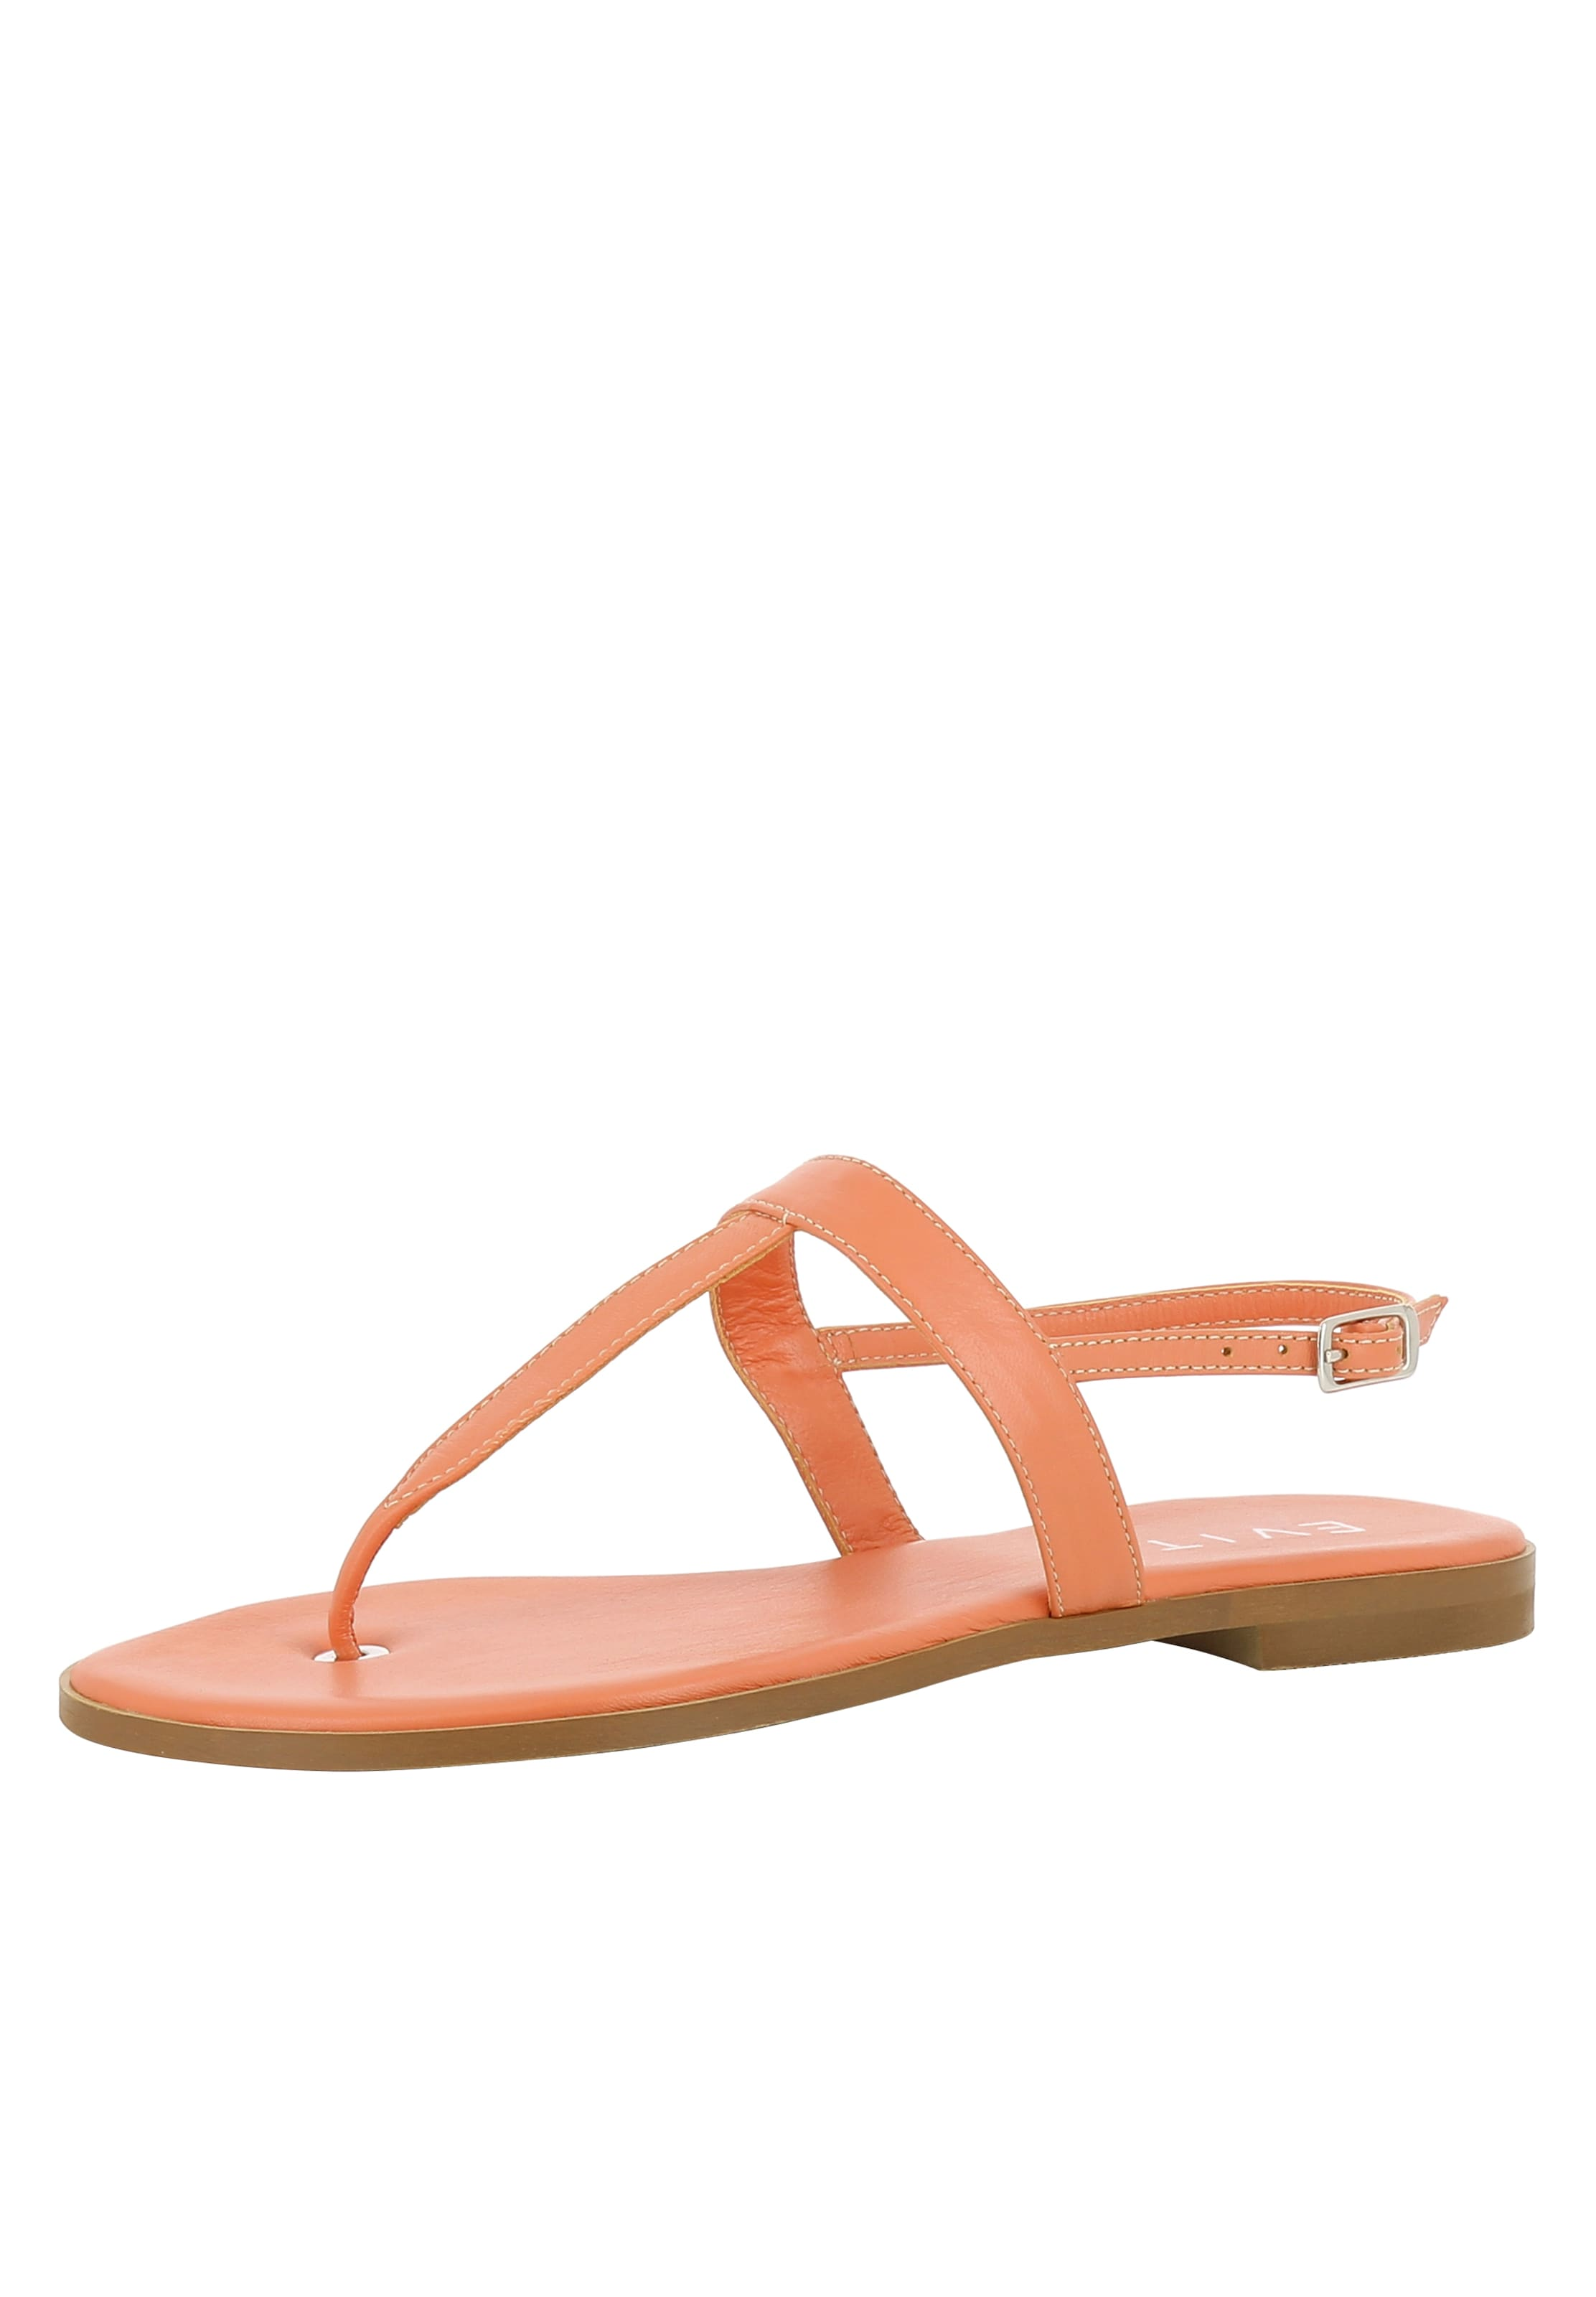 Haltbare Mode billige Schuhe EVITA | Sandale Sandale Sandale 'OLIMPIA' Schuhe Gut getragene Schuhe afe85e